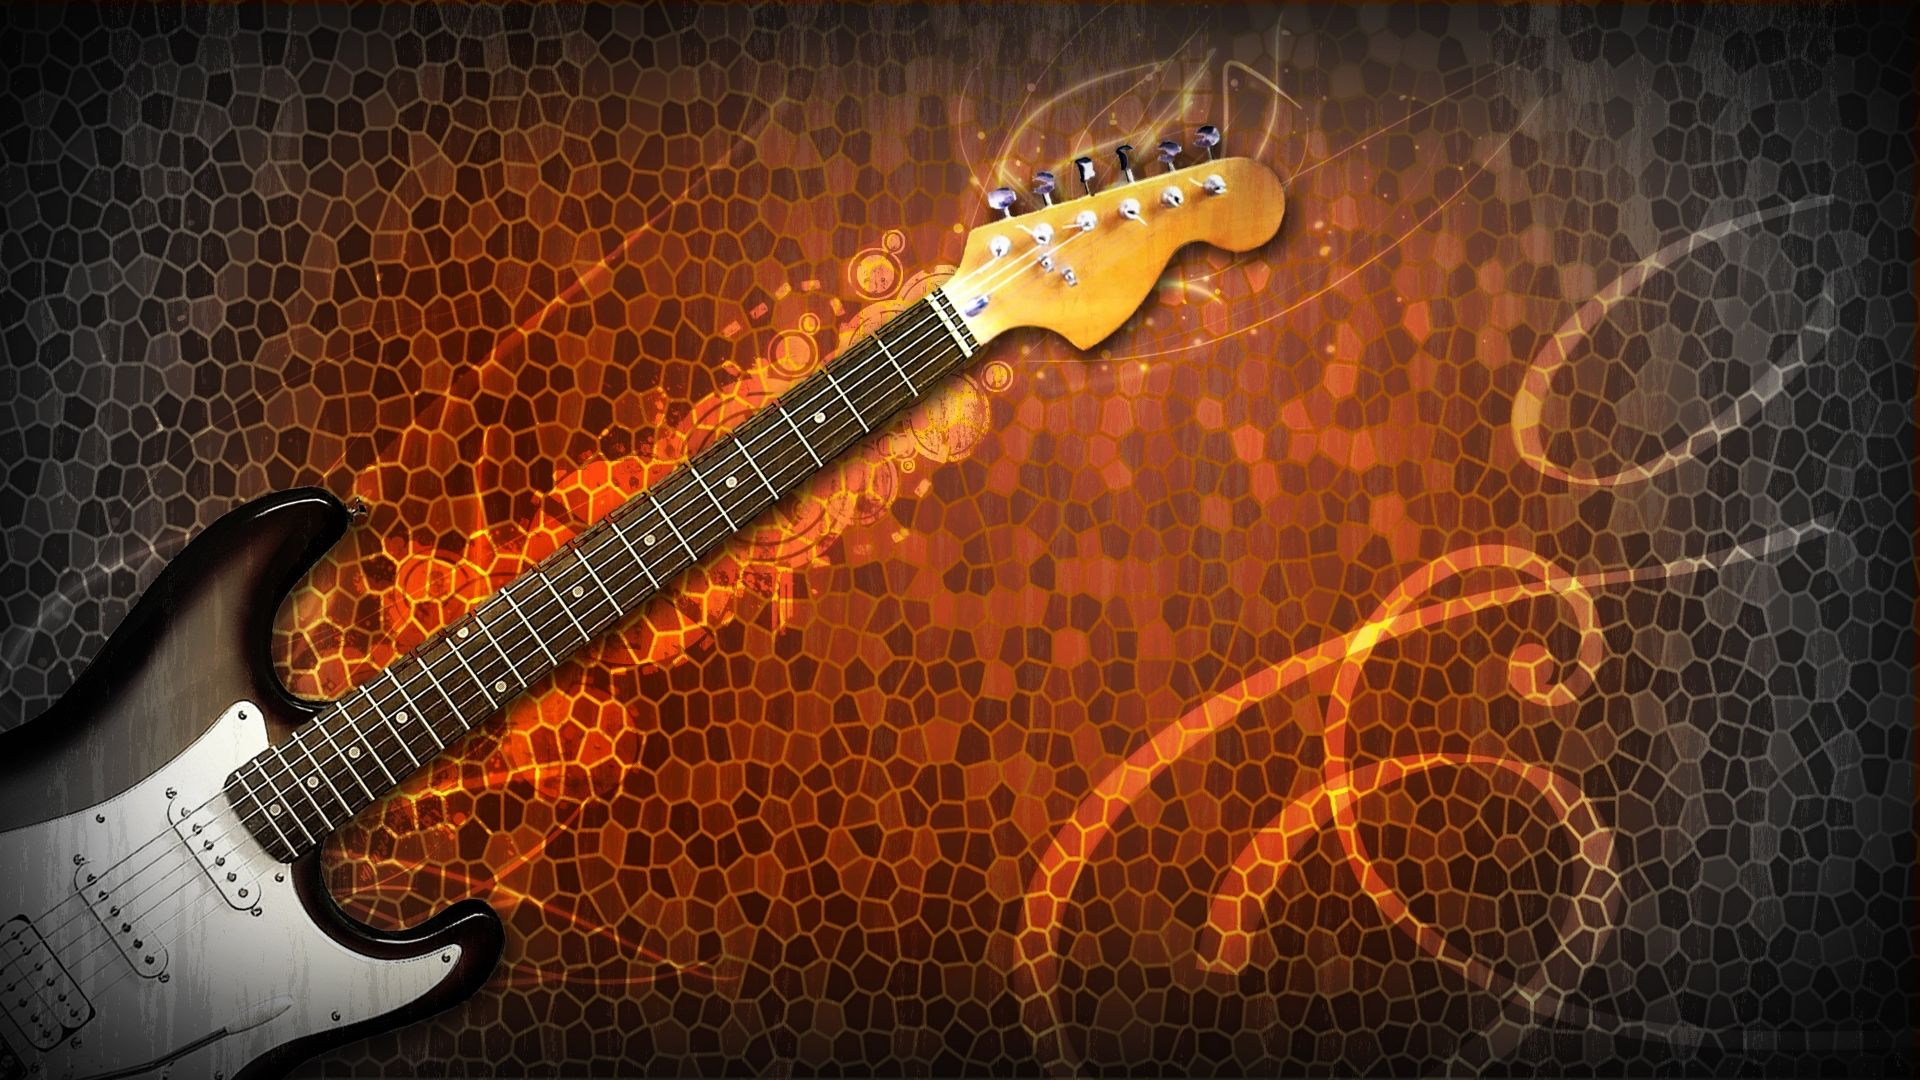 Guitar Abstract, Full HD Wallpaper